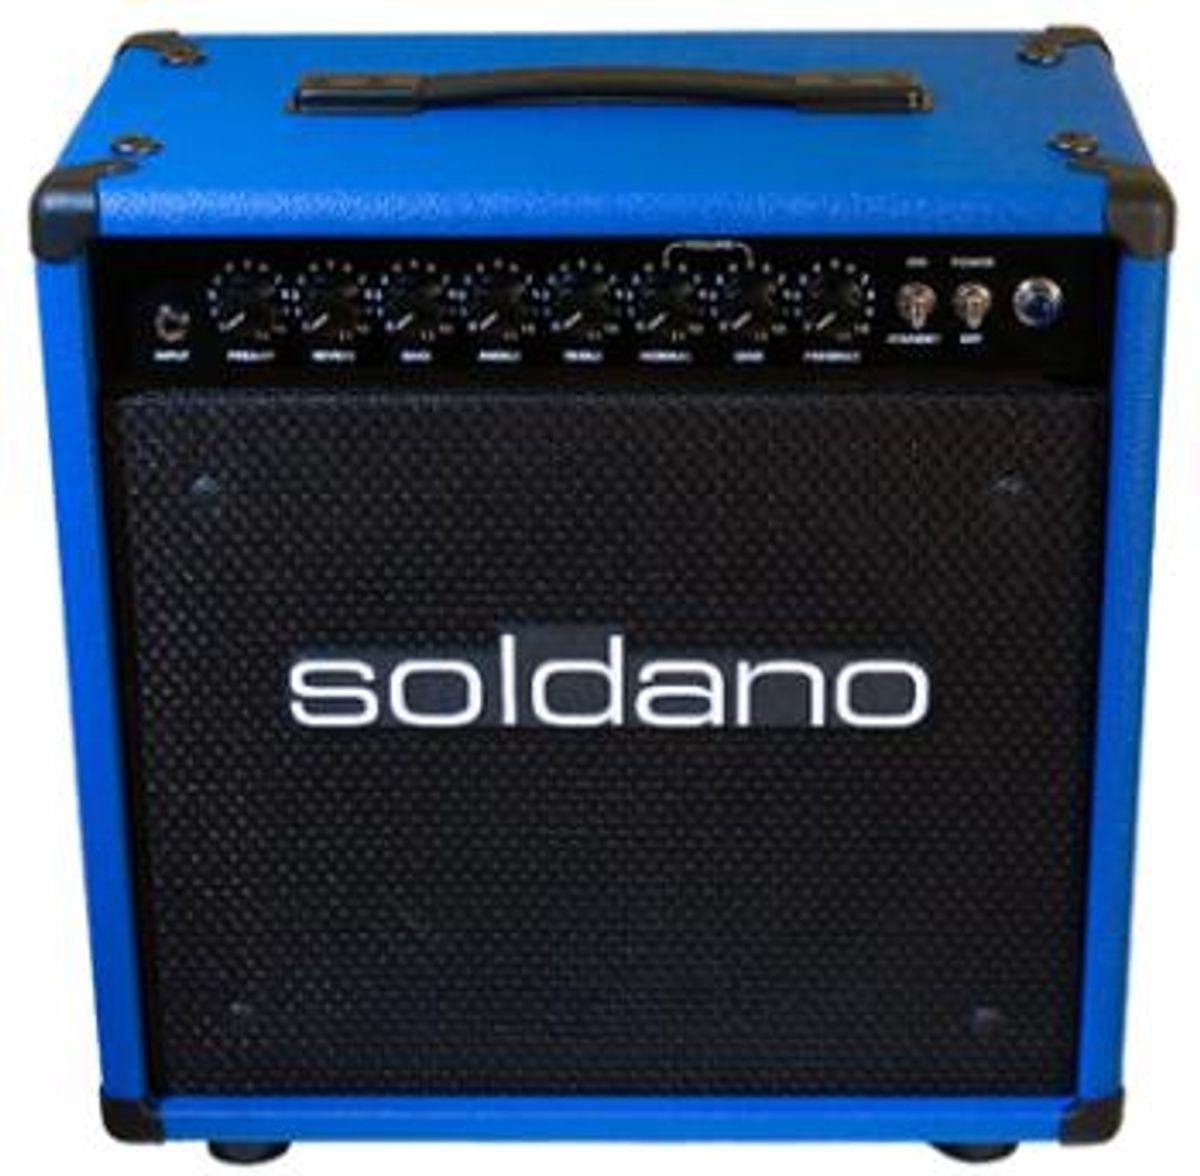 Review: Soldano 44 Blues City Music Signature Amp